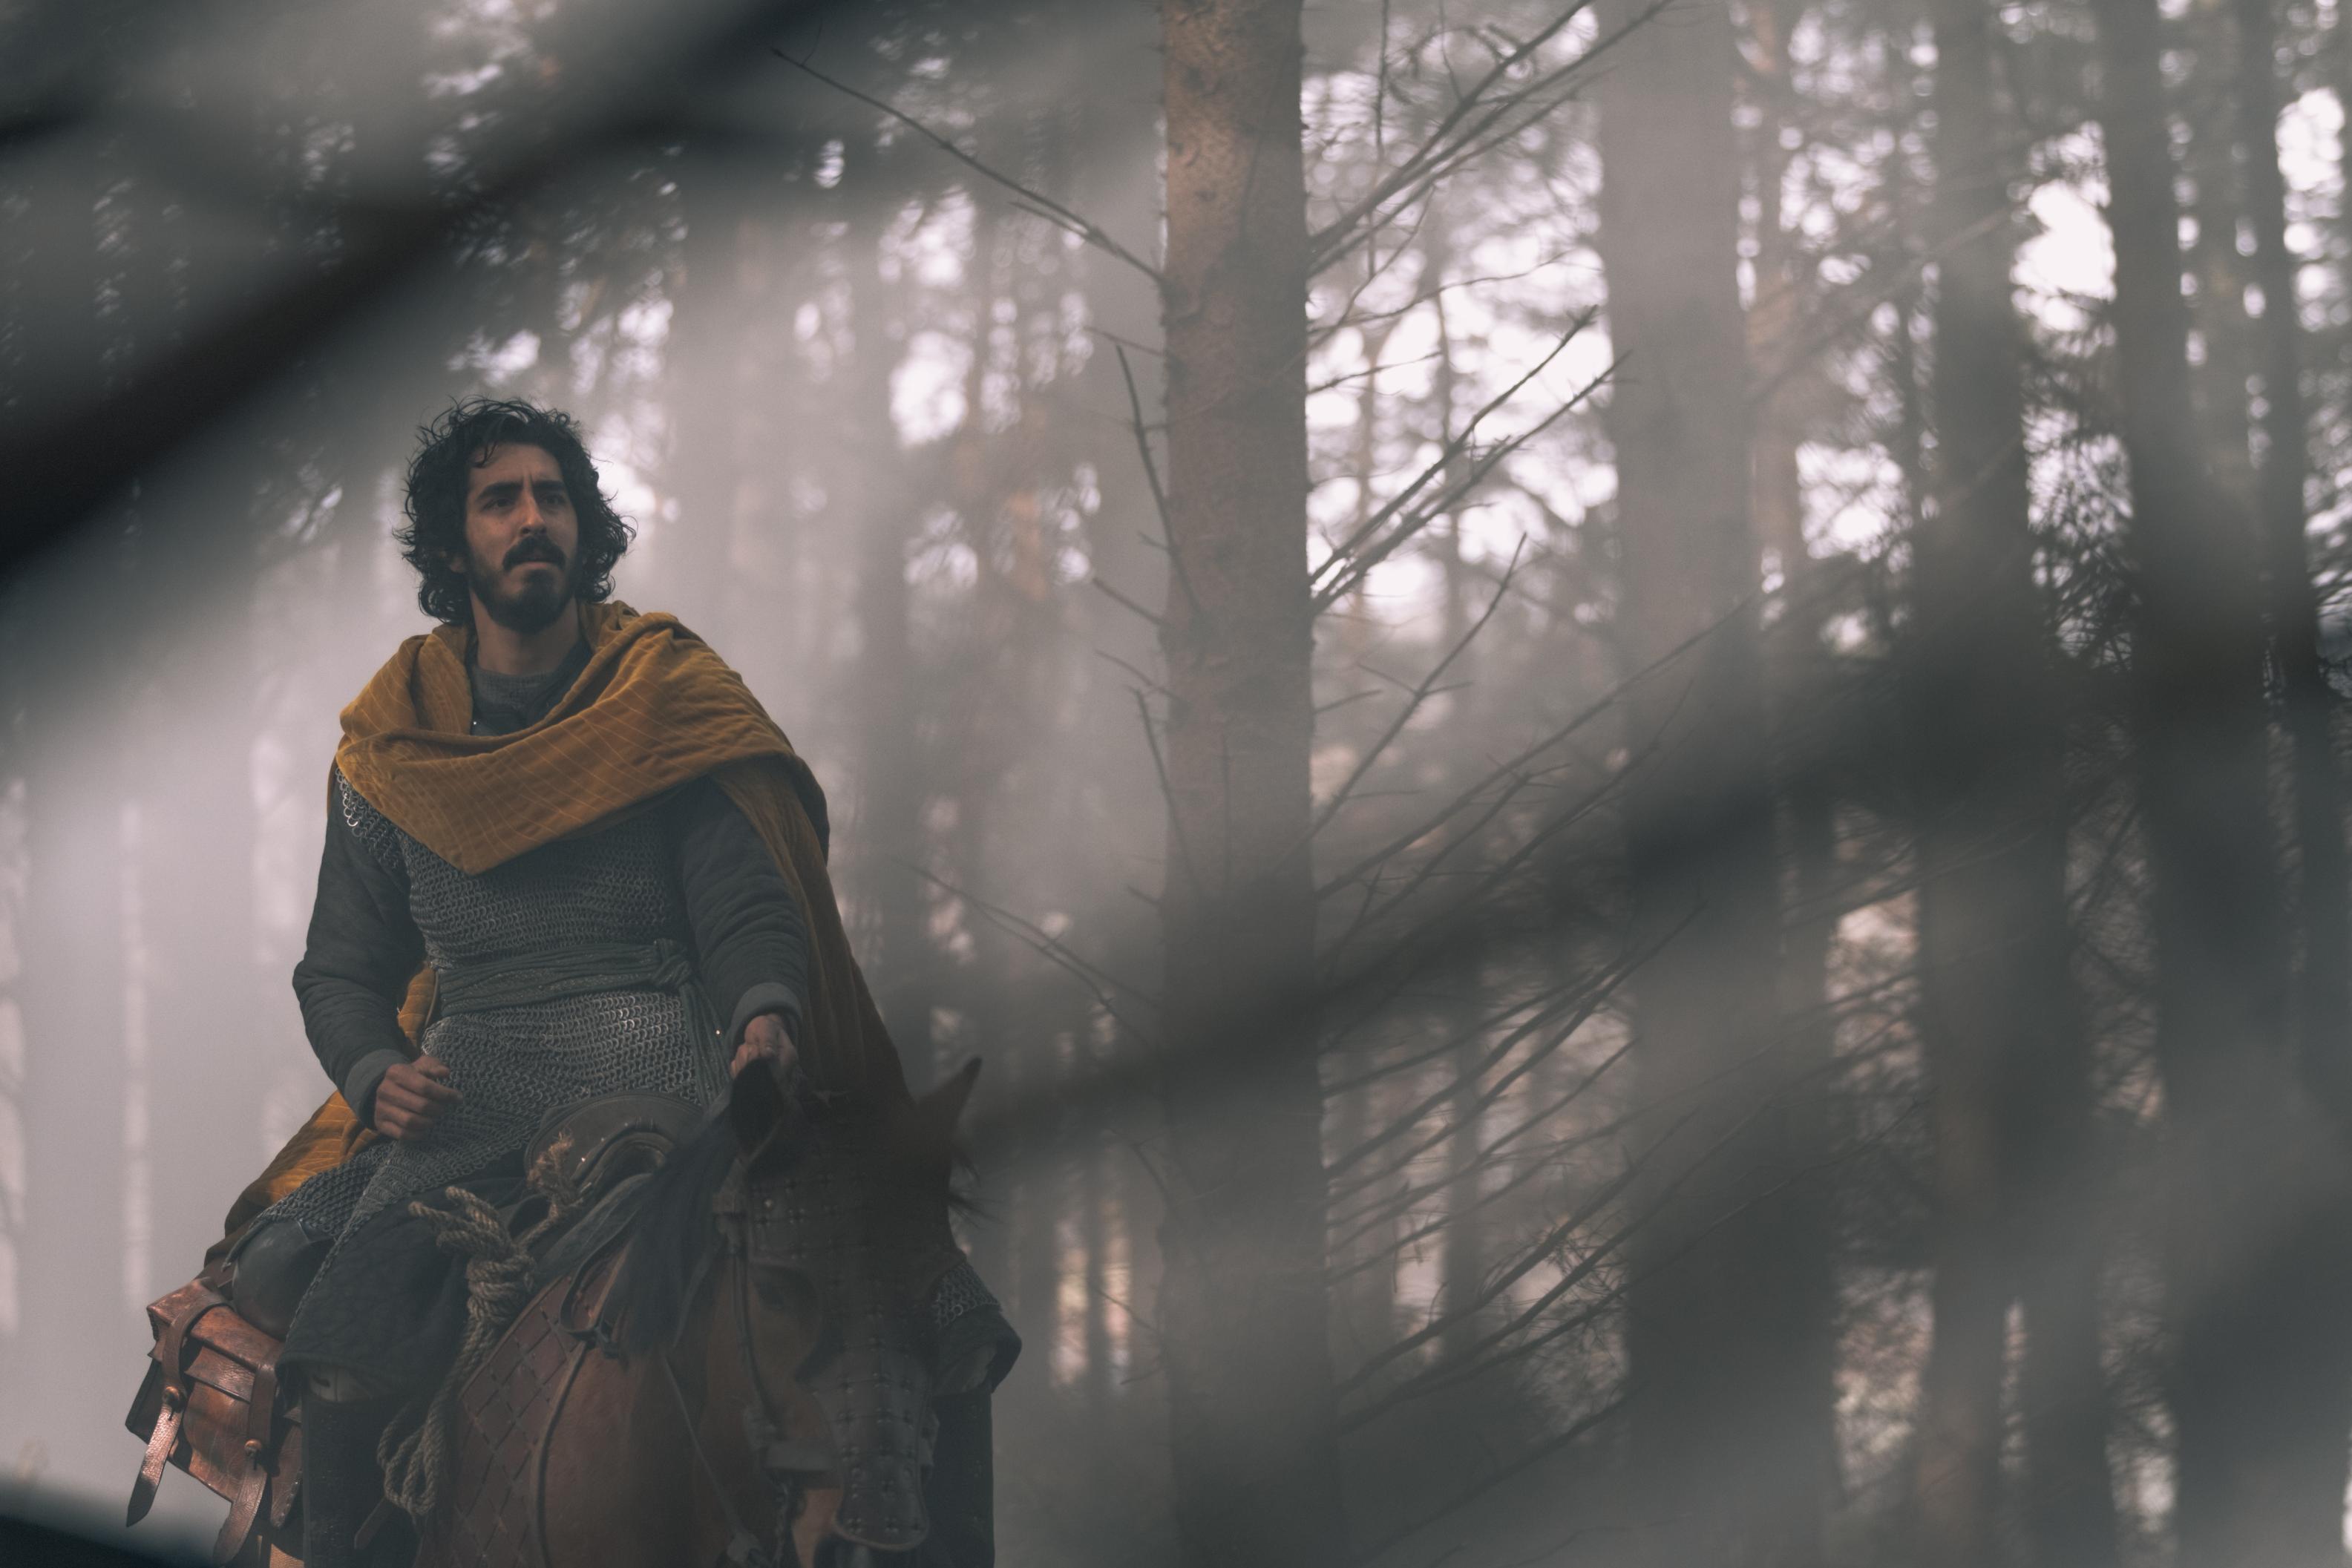 'The Green Knight' takes a dream-like trip through the Arthurian legend